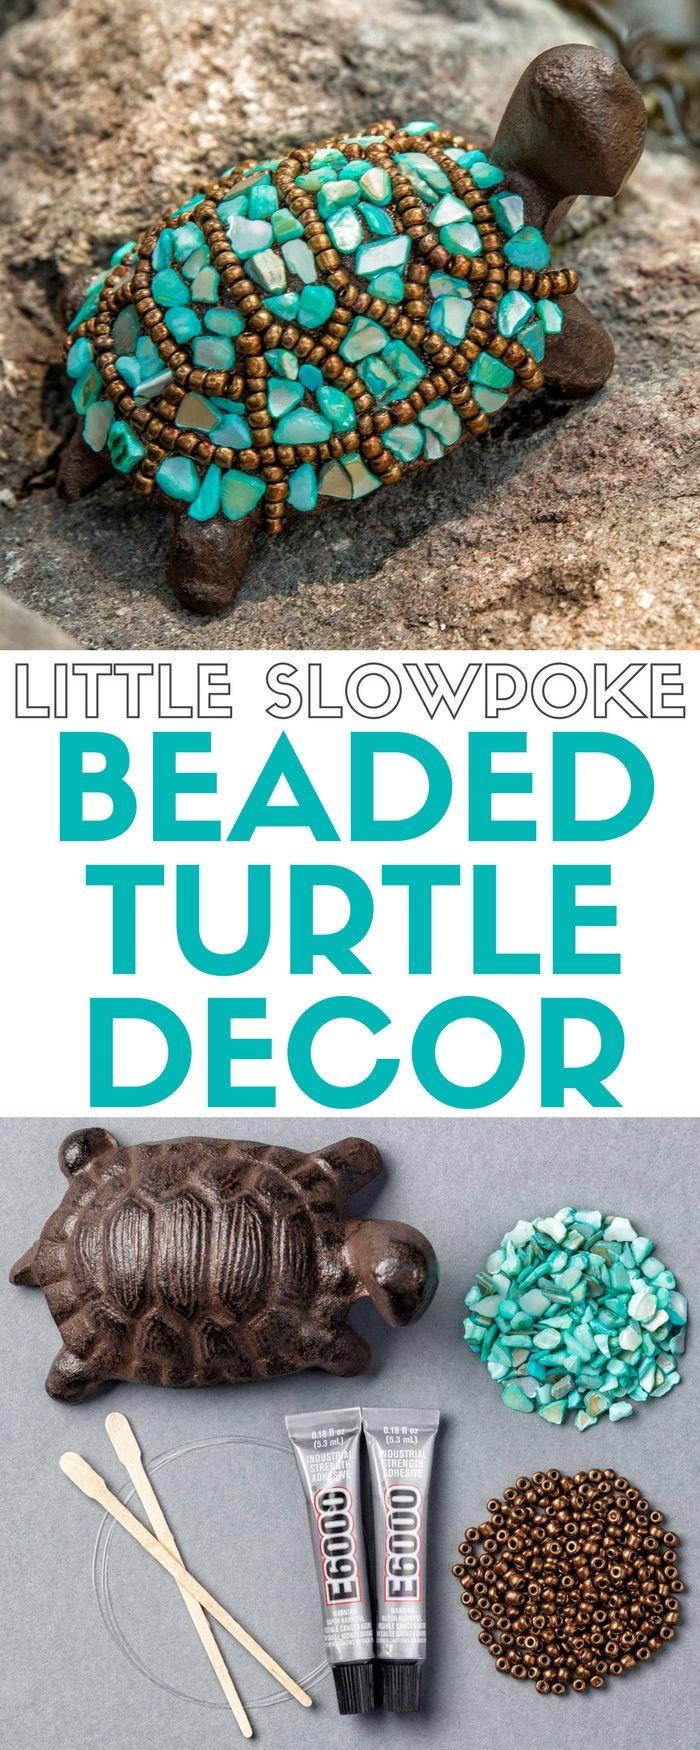 Little Slowpoke   Apostrophe S Craft Kit   Home Decor   Garden Decor   Beaded Turtle